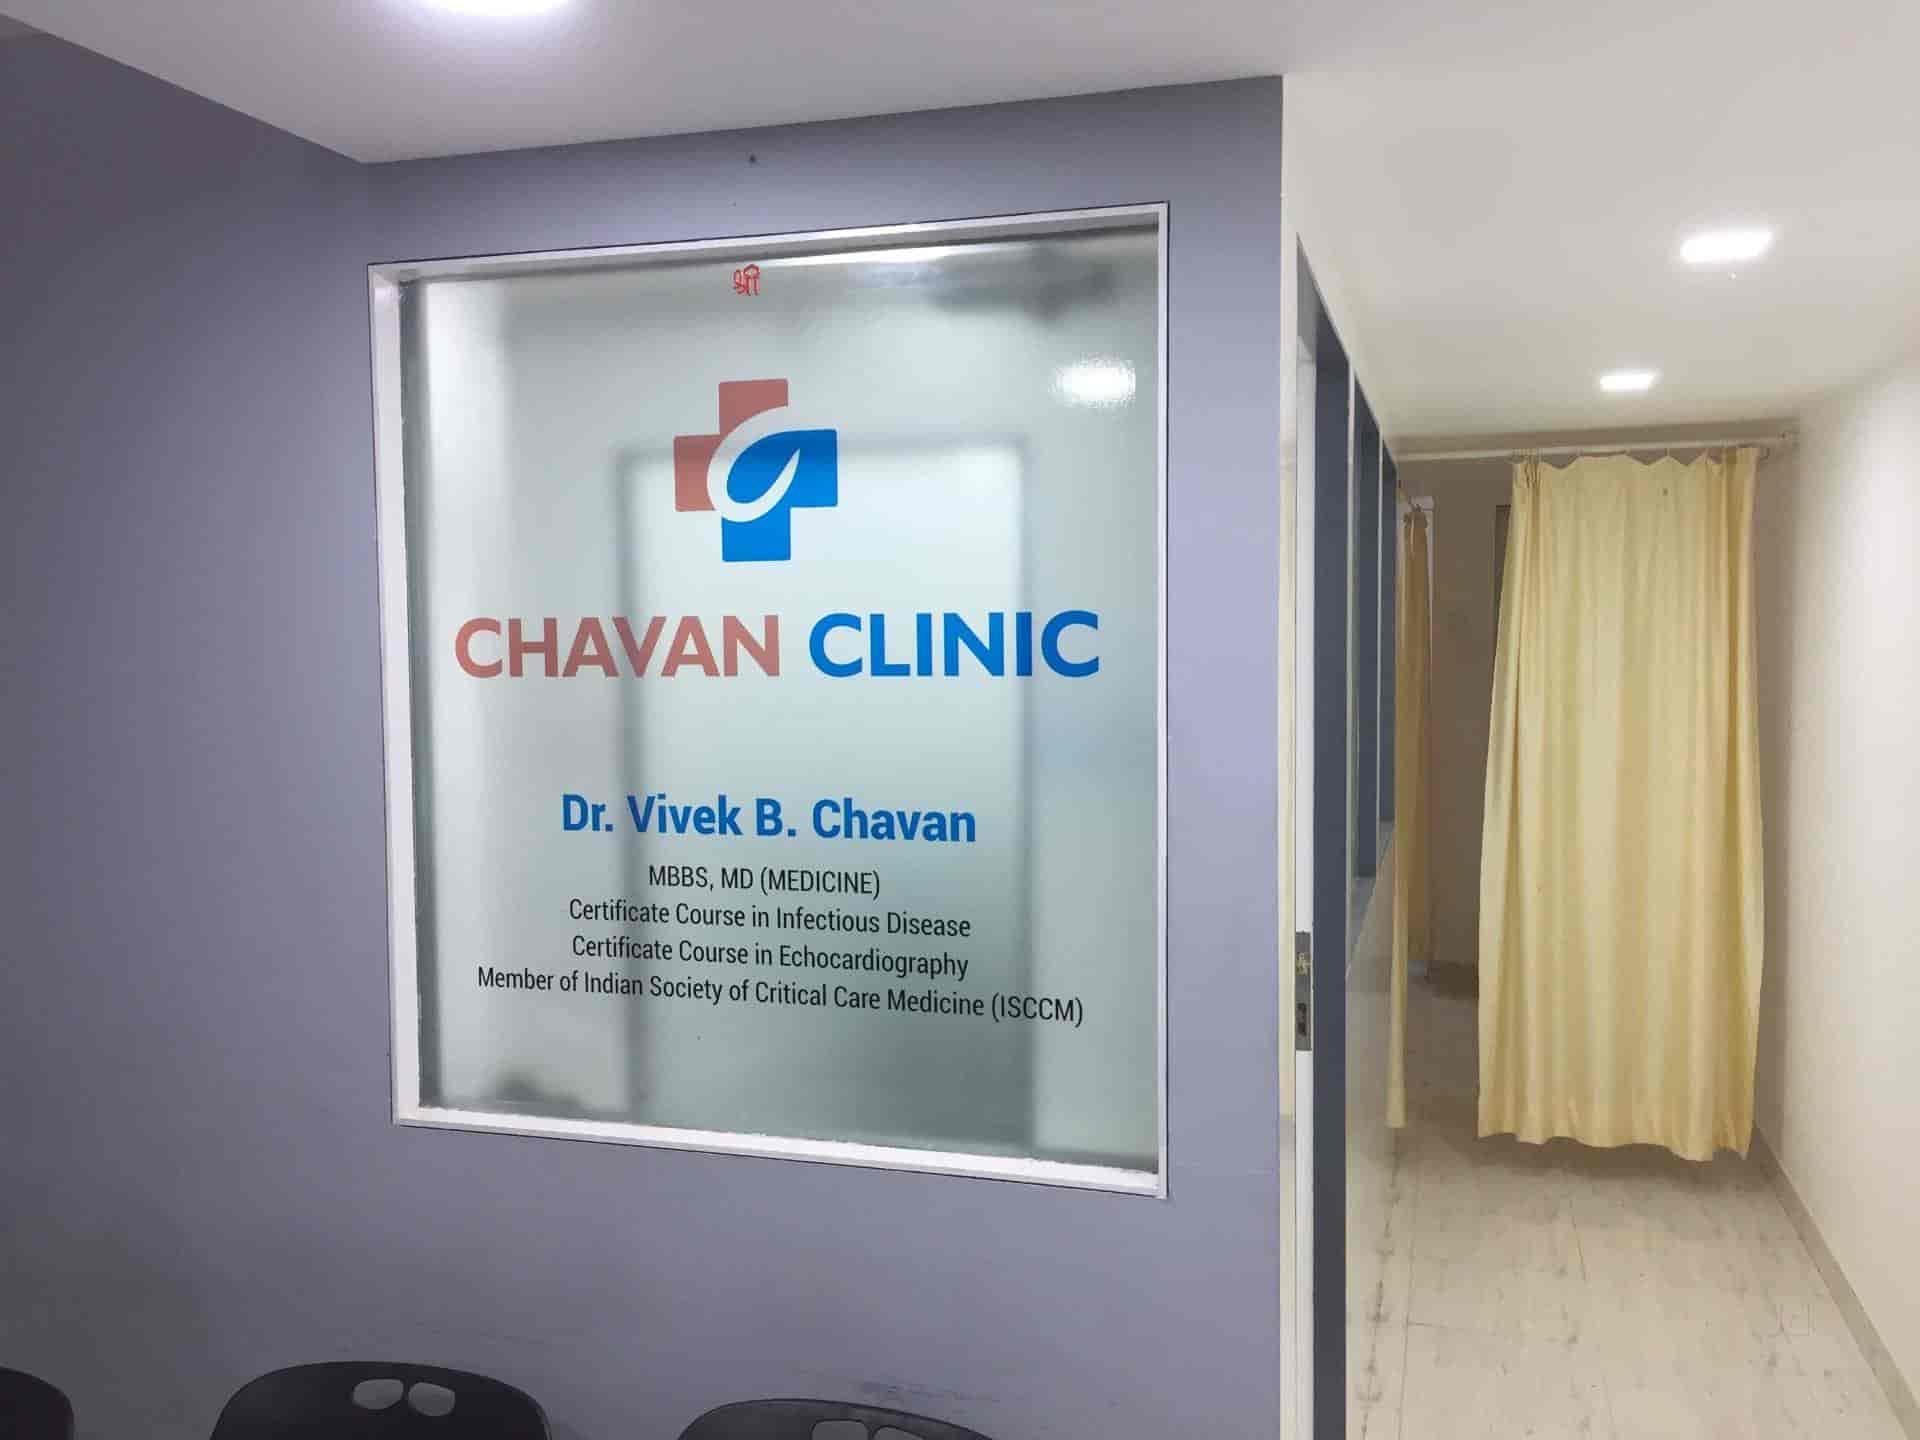 Chavan Clinic Photos, Kothrud, Pune- Pictures & Images